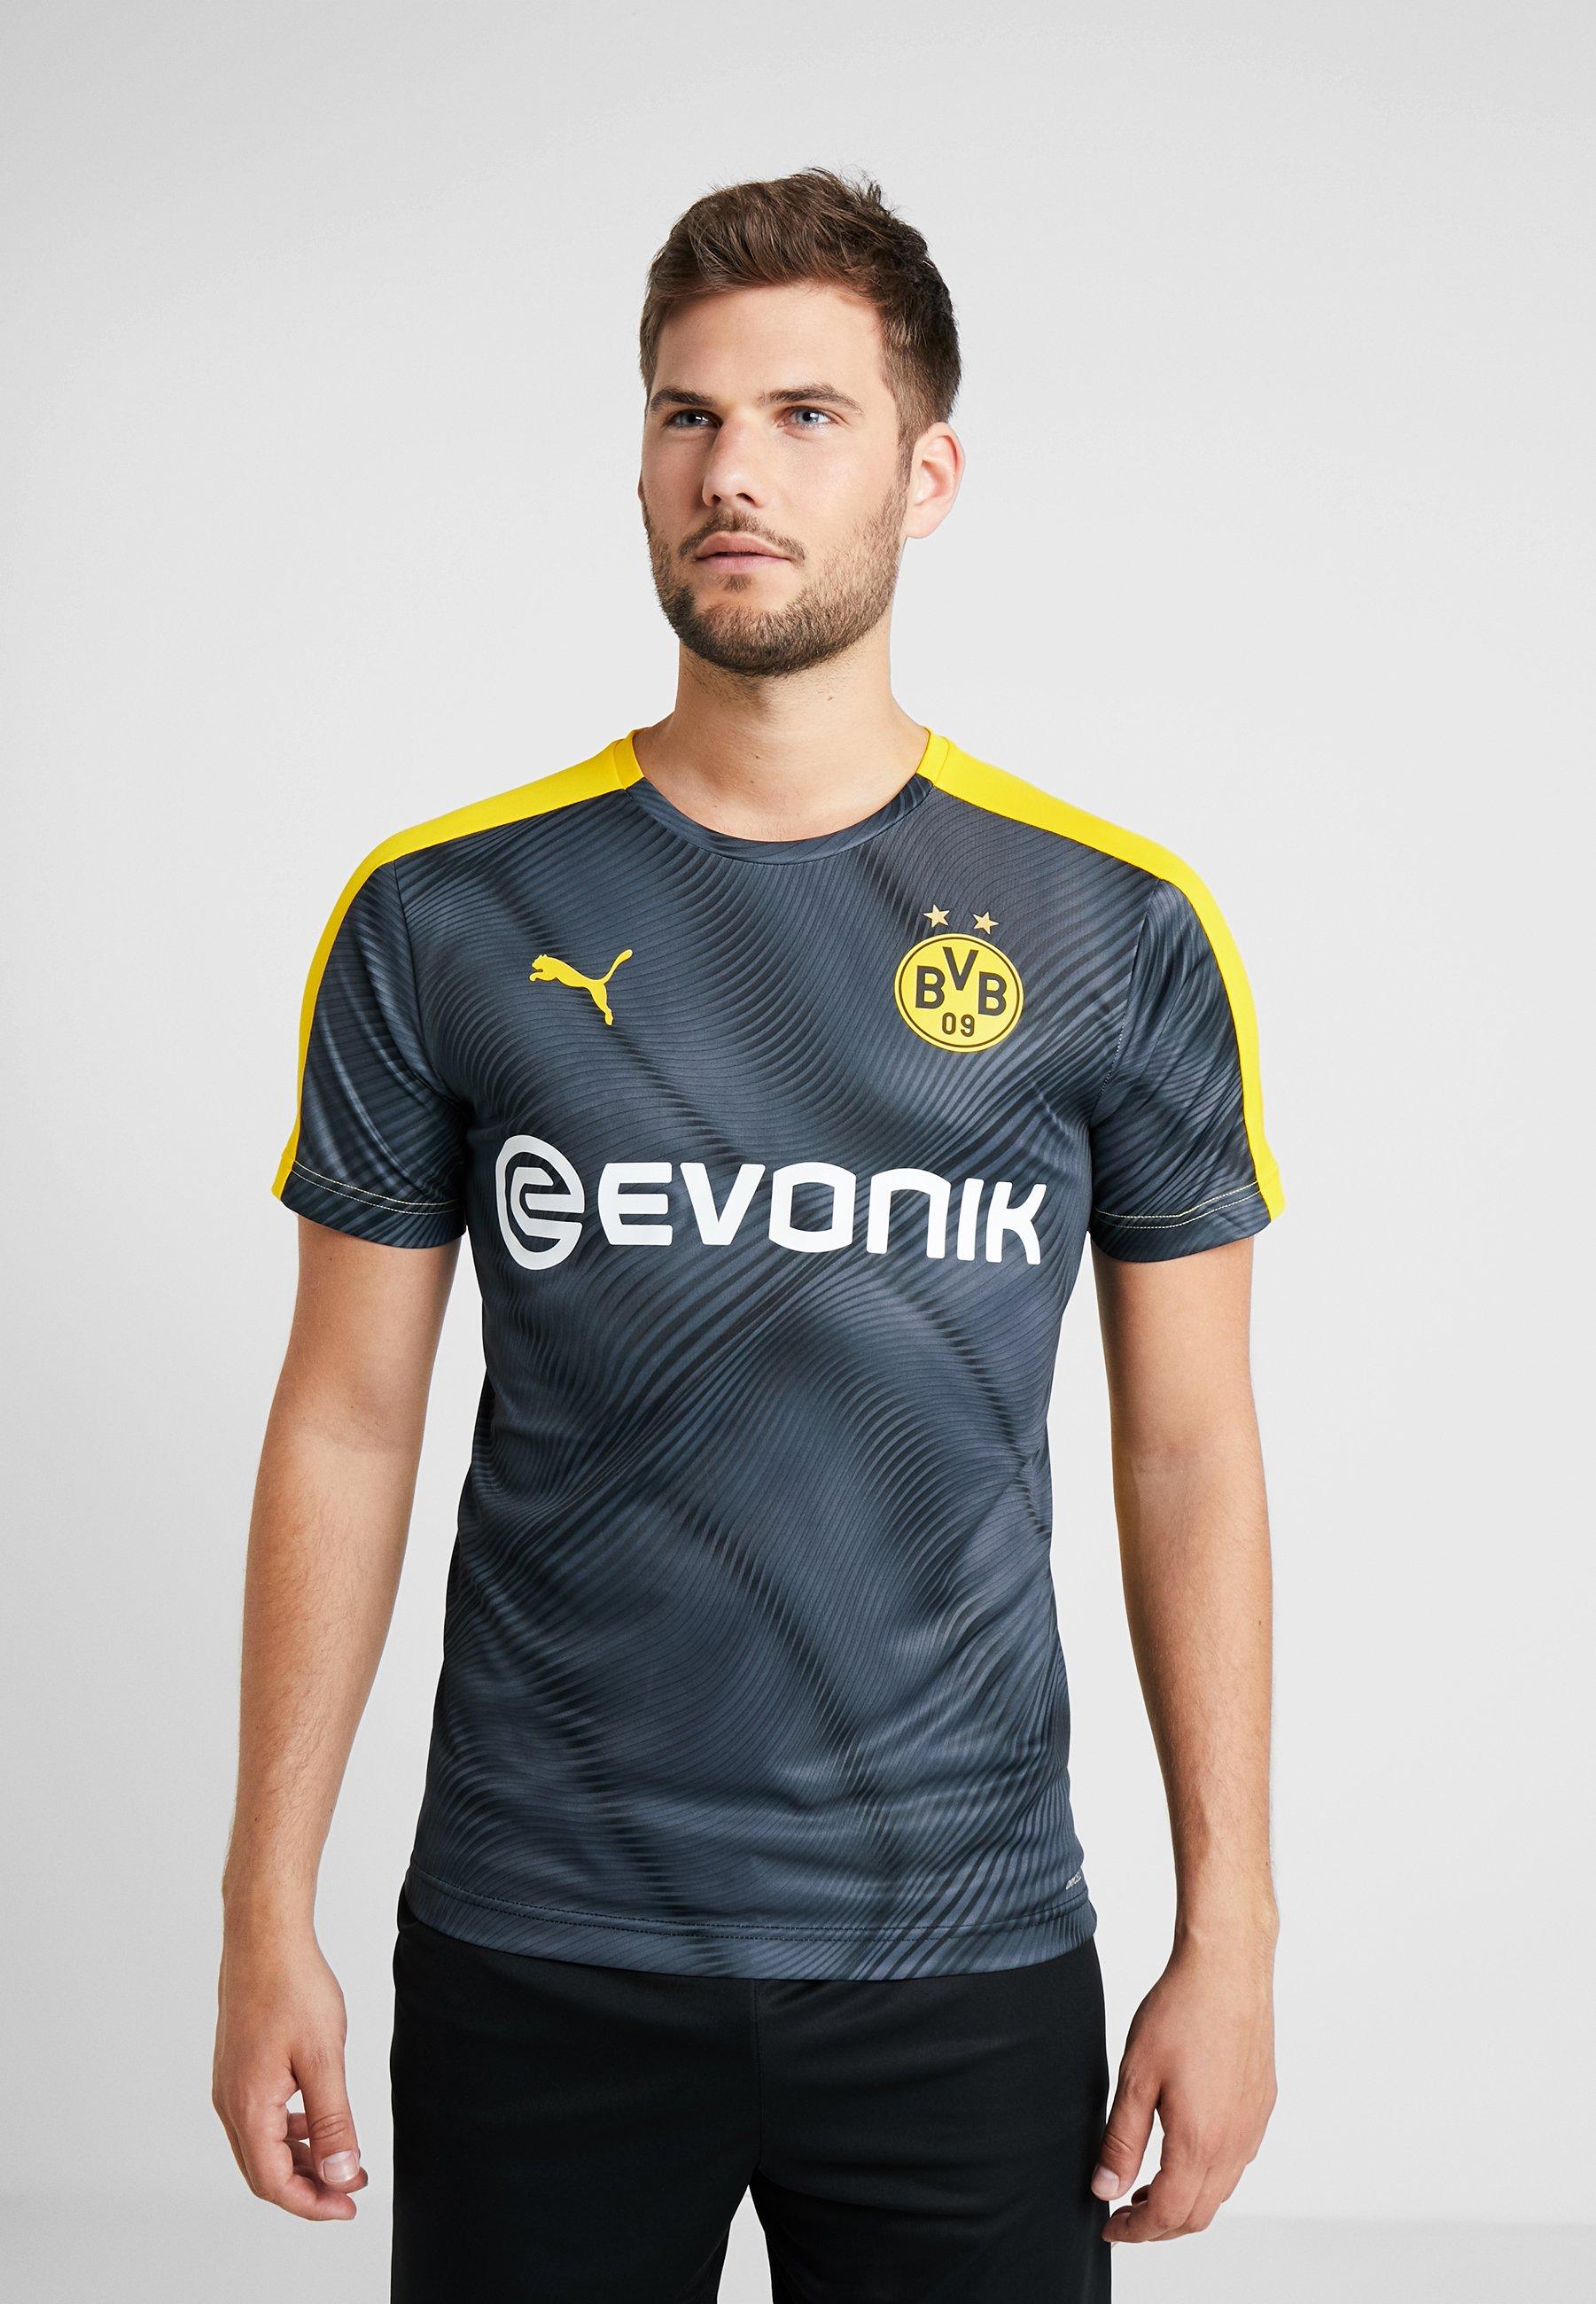 Puma Cyber Borussia Stadium De EvonikArticle Yellow Supporter black Dortmund Bvb League With HD92IWEY